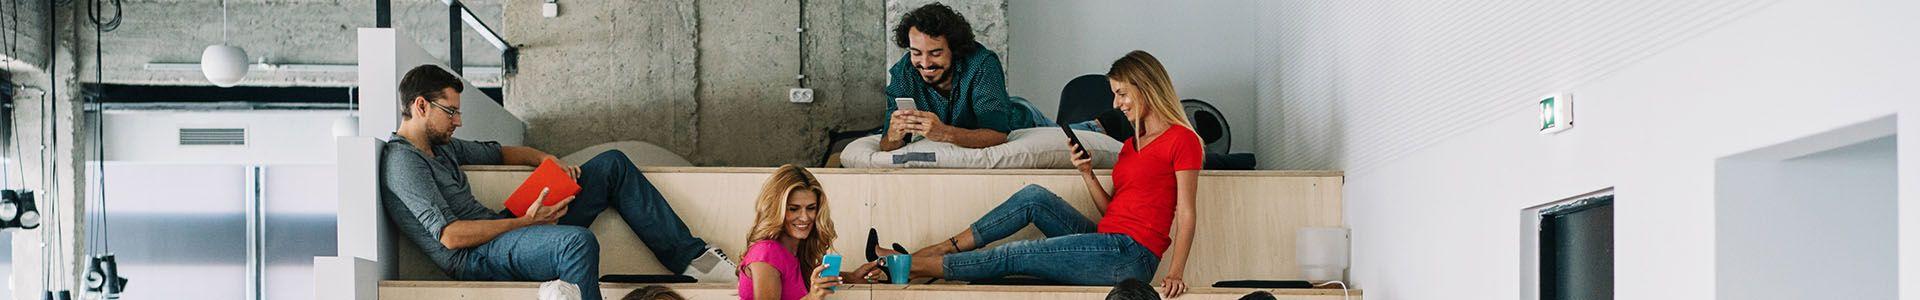 SafeLink Wireless Refill | Buy prepaid data from $15